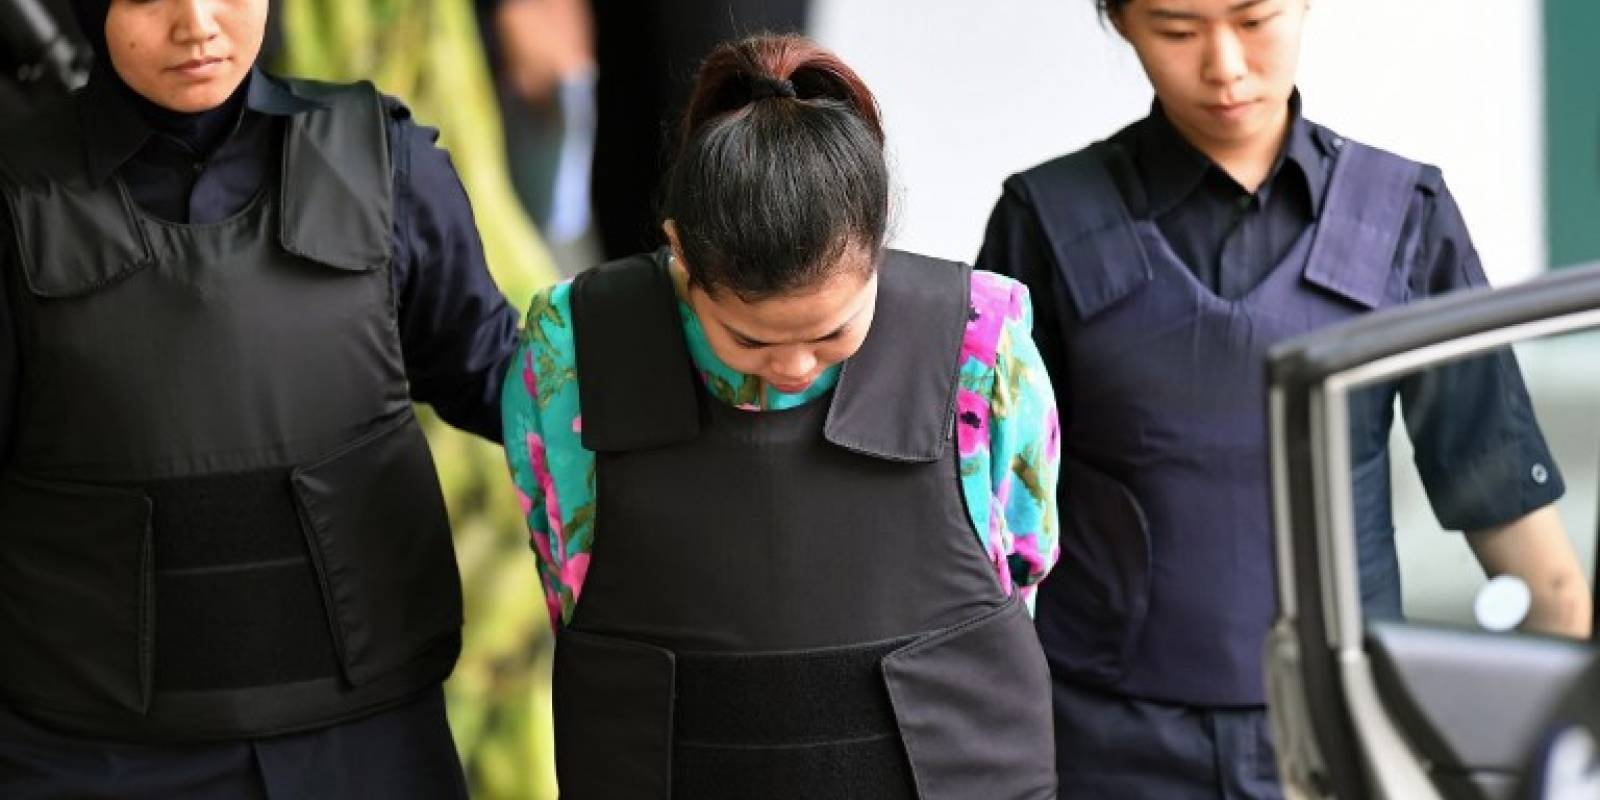 Siti Aisyah, mujer arrestada por el asesinato de Kim Jong-nam